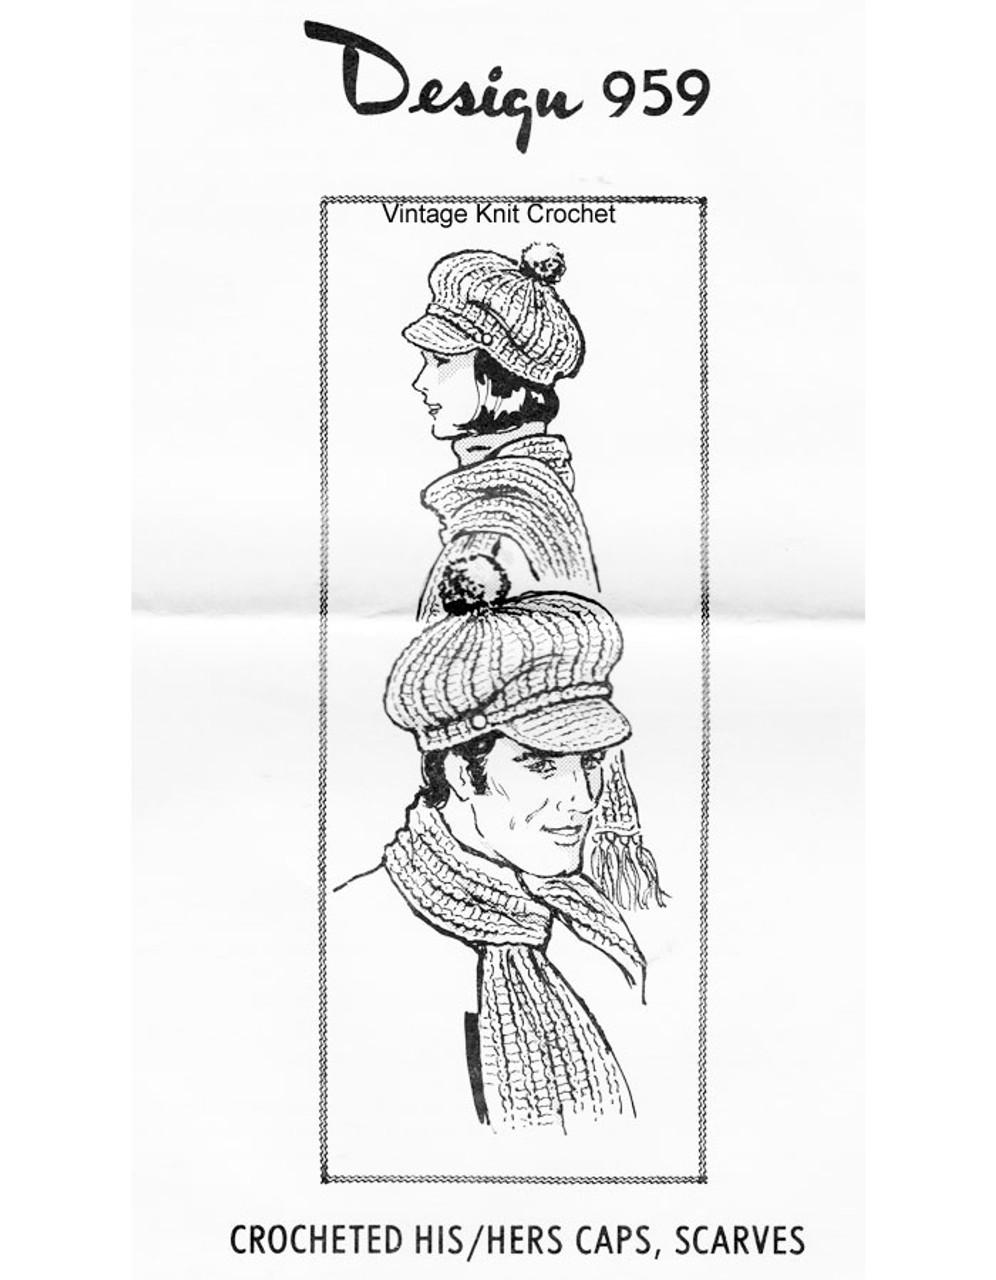 Mans Crocheted Visor Cap Scarf Pattern Design 959